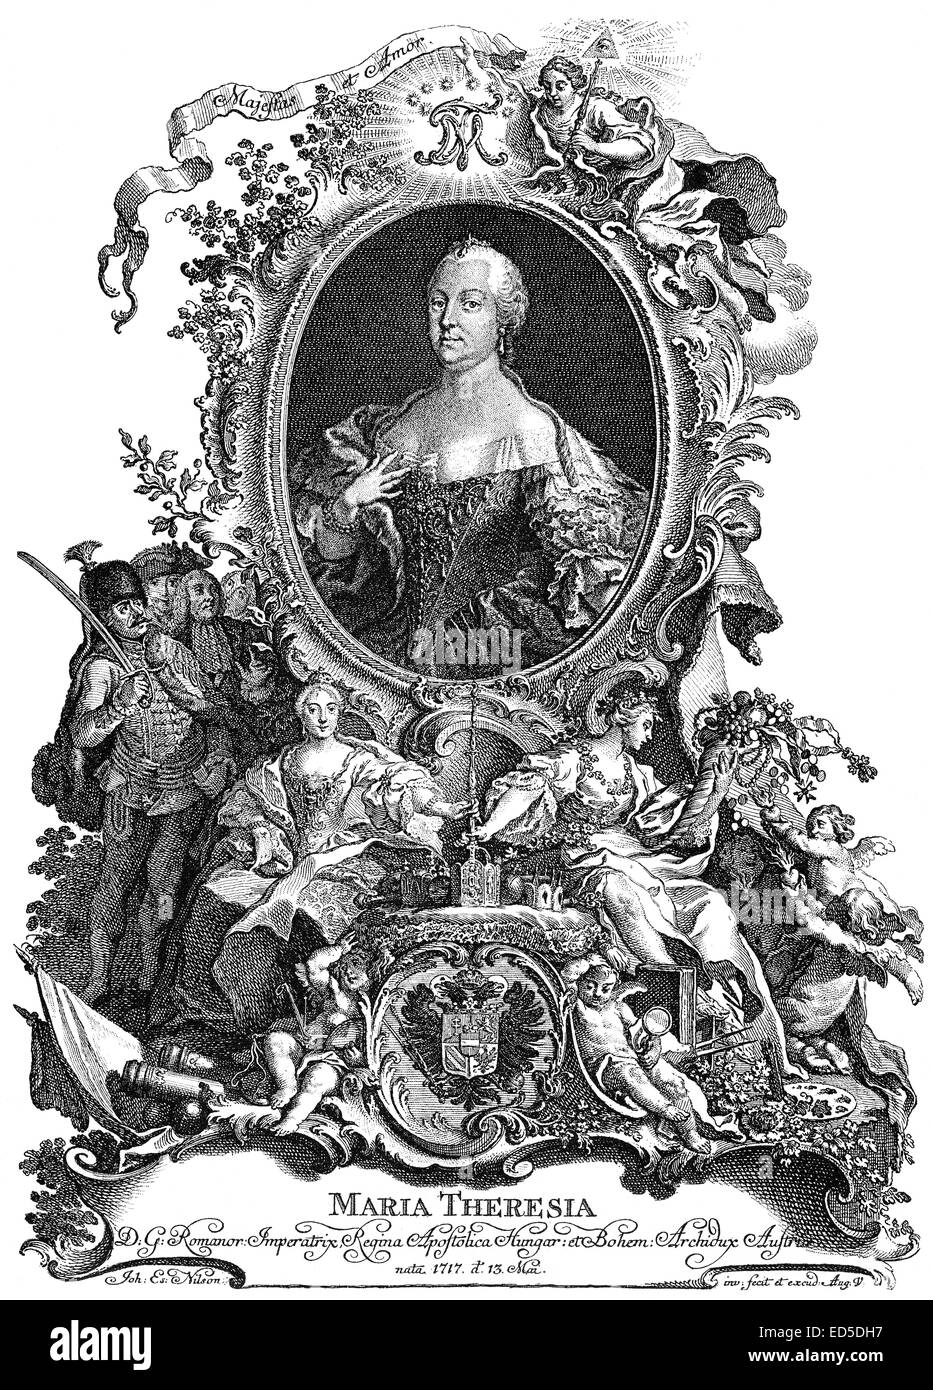 Maria Theresa of Austria, 1717 - 1780, Archduchess of Austria and Queen of Hungary, Croatia and Bohemia, Maria Theresia Stock Photo